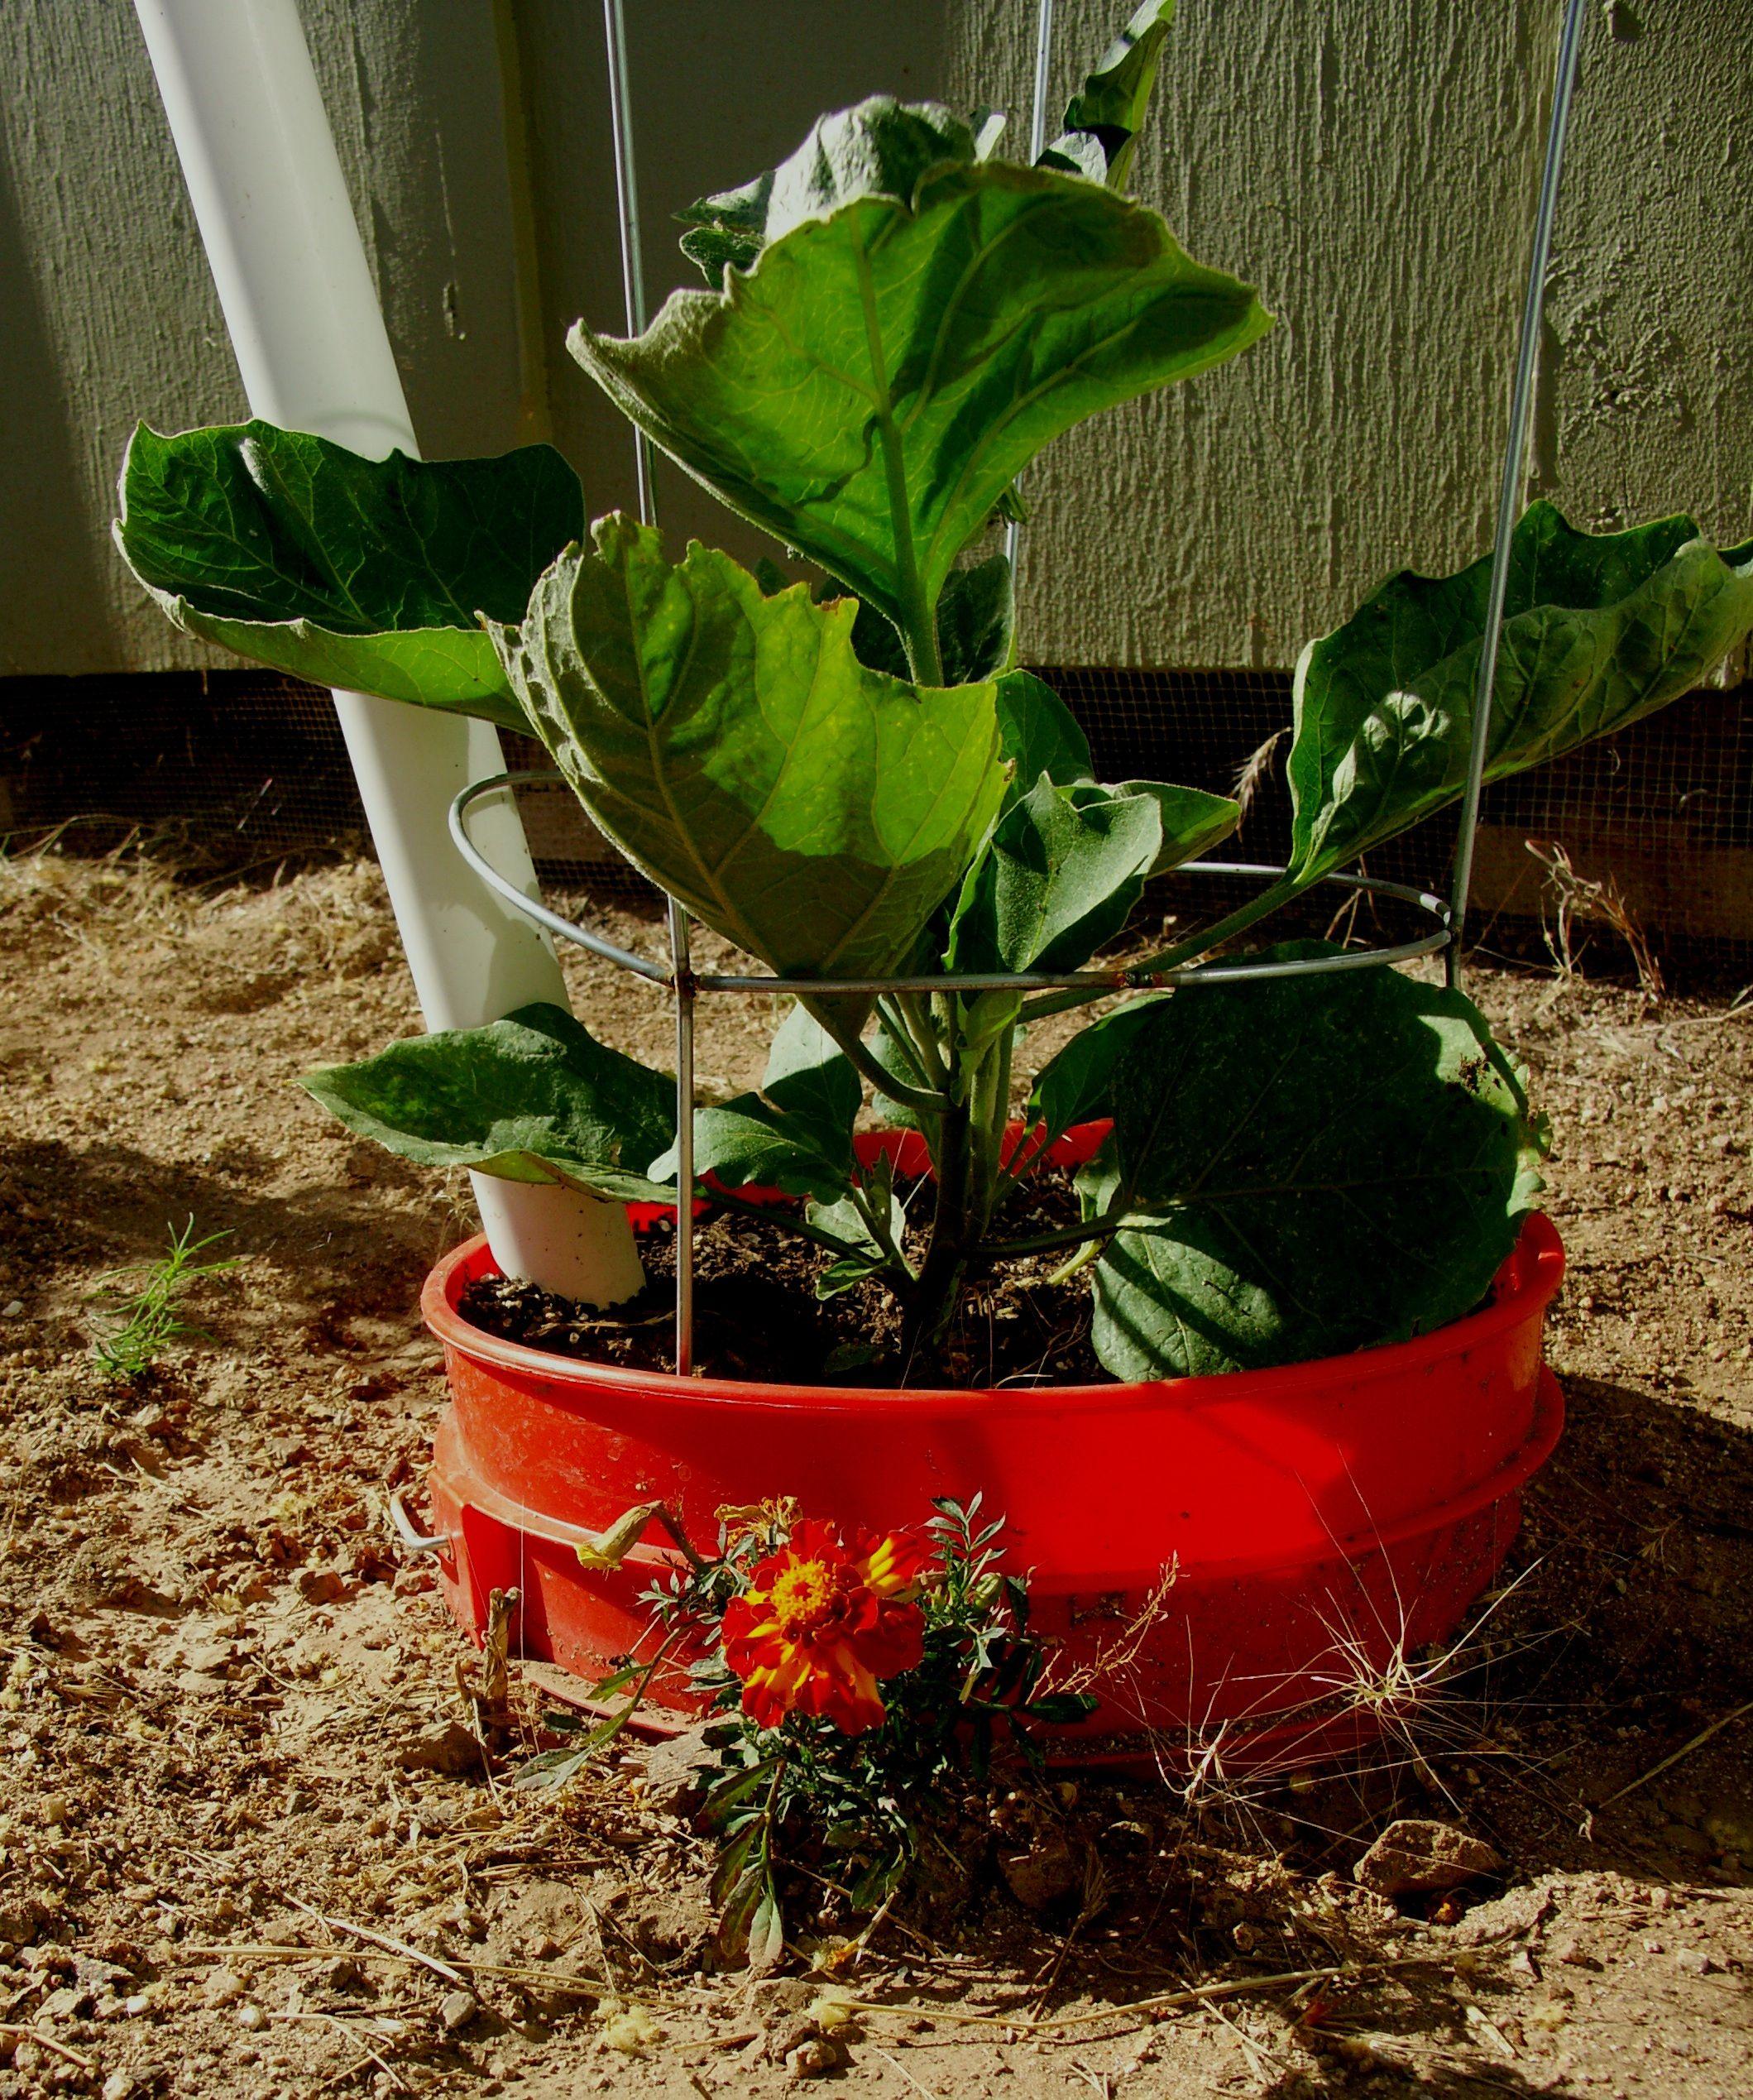 Bucket gardens start with Home Depot buckets